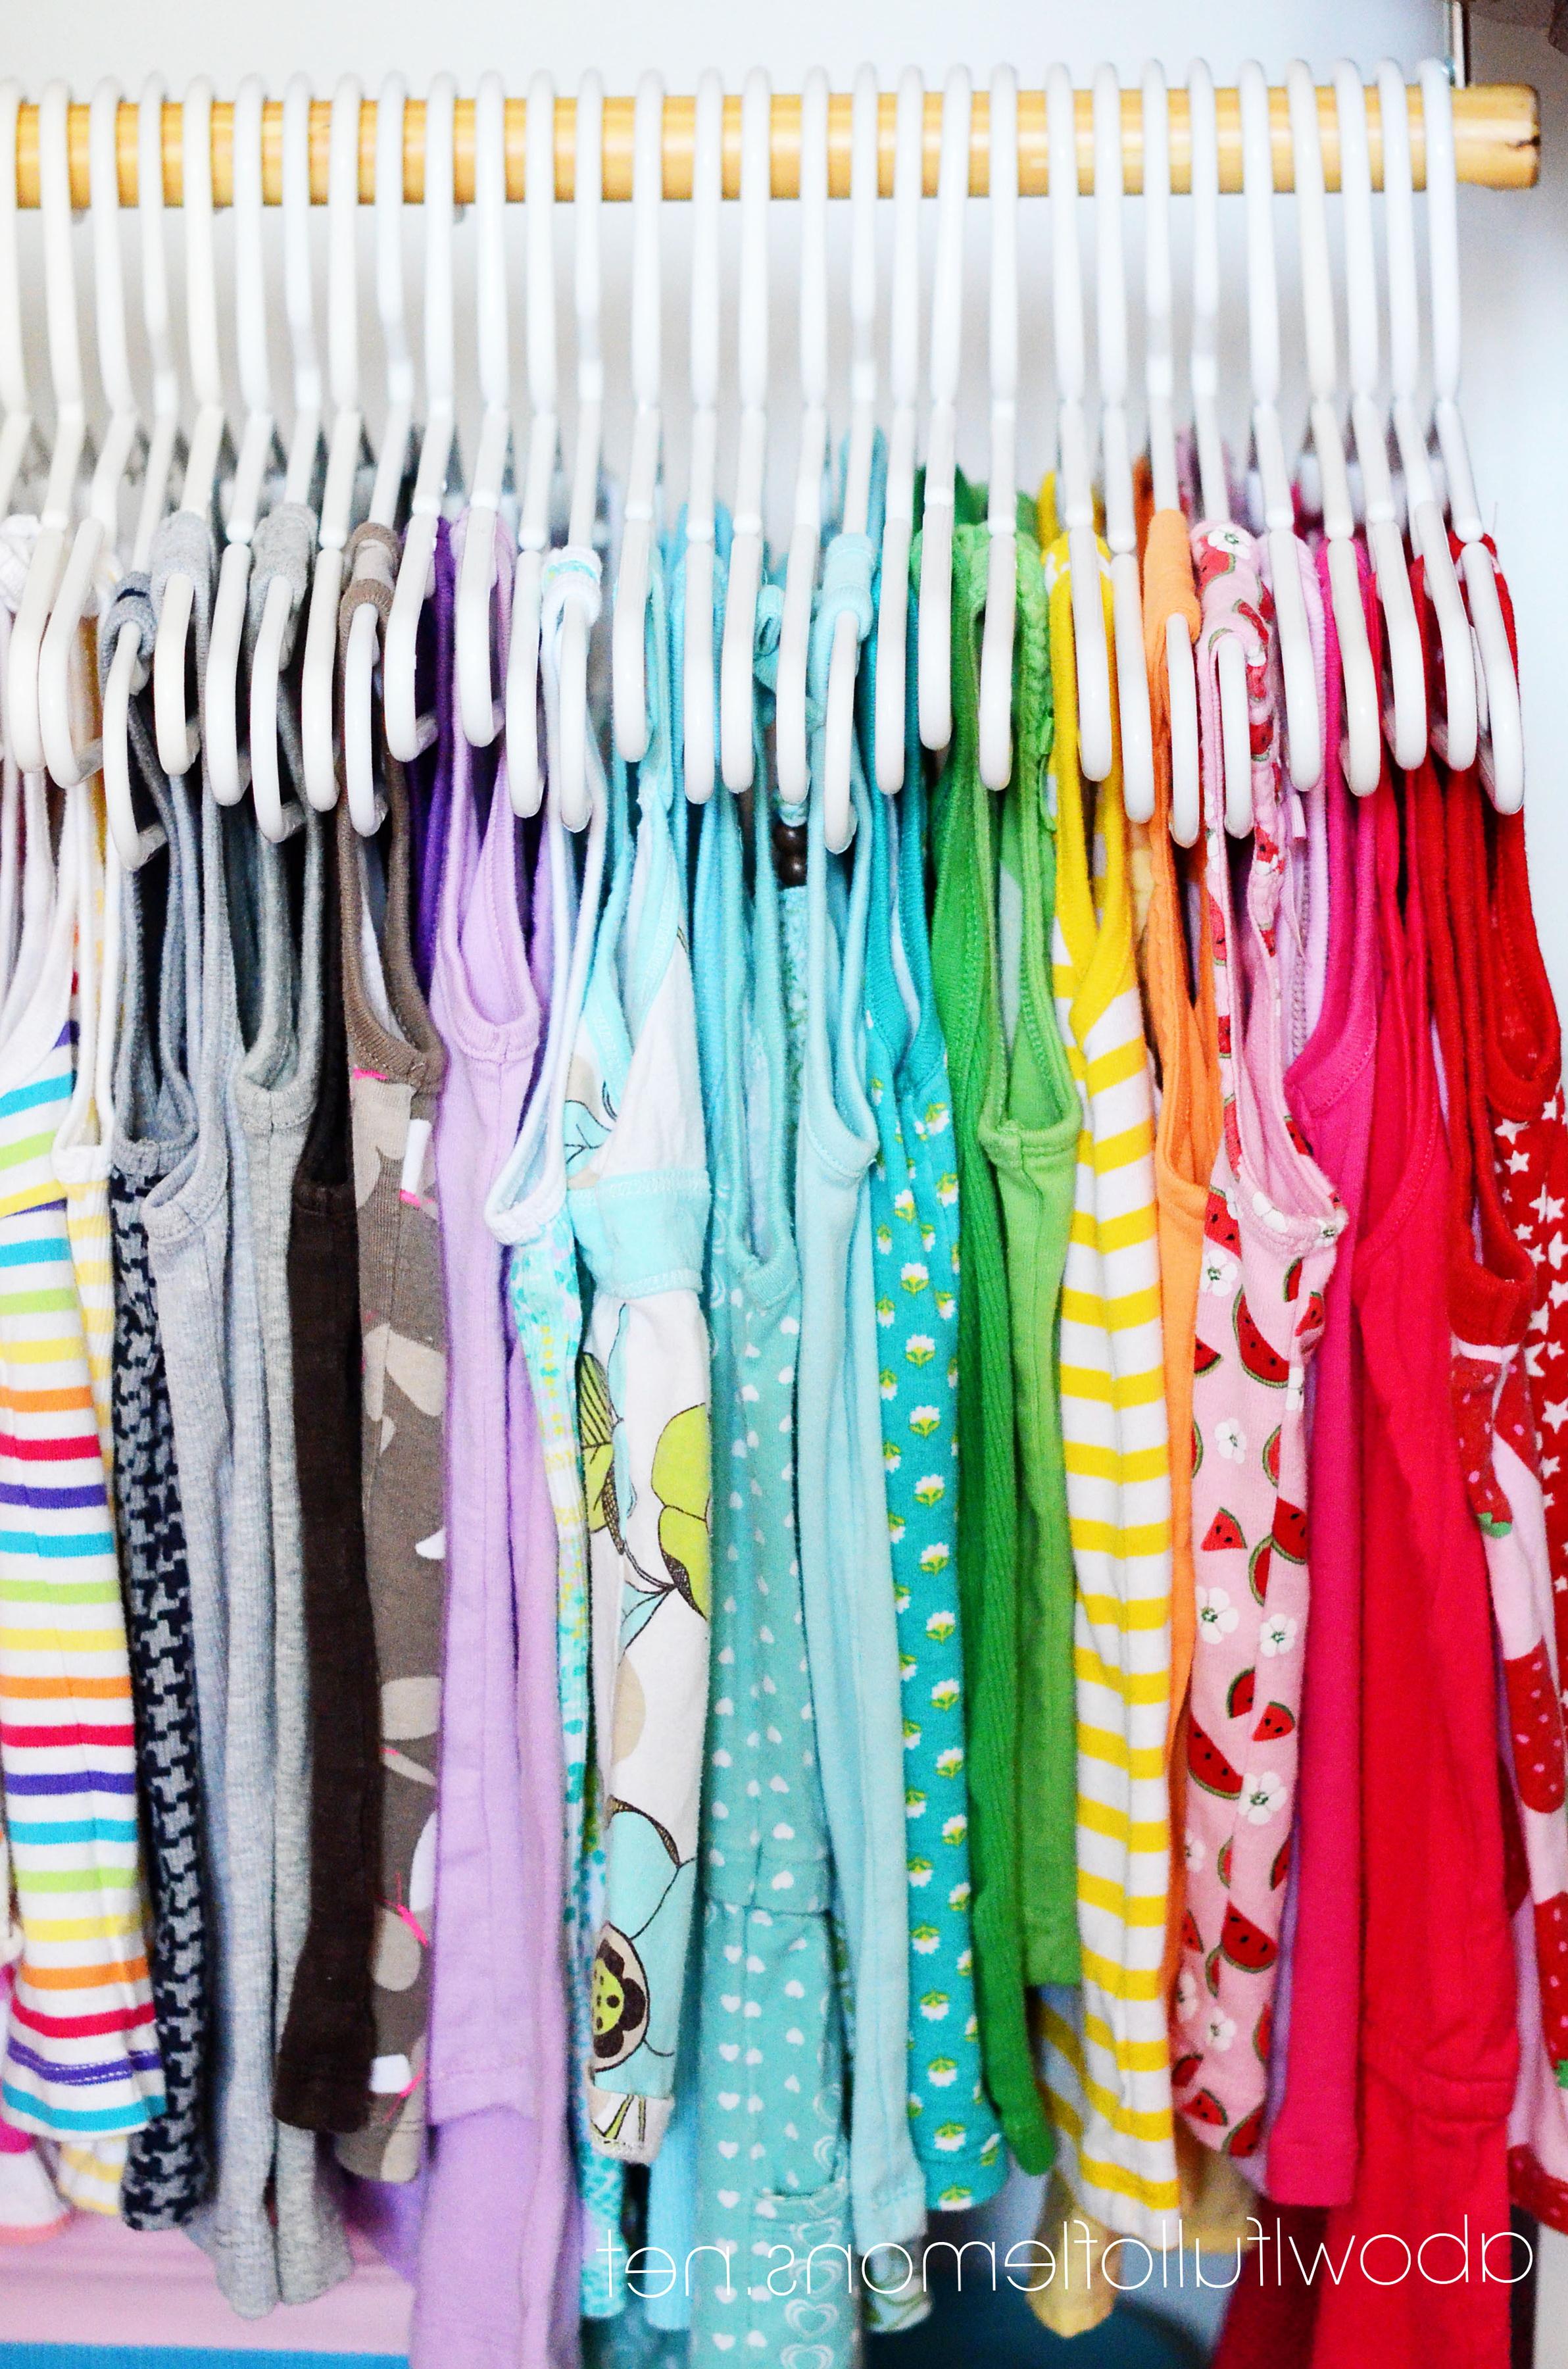 The Clothes Closet Consignment Shop